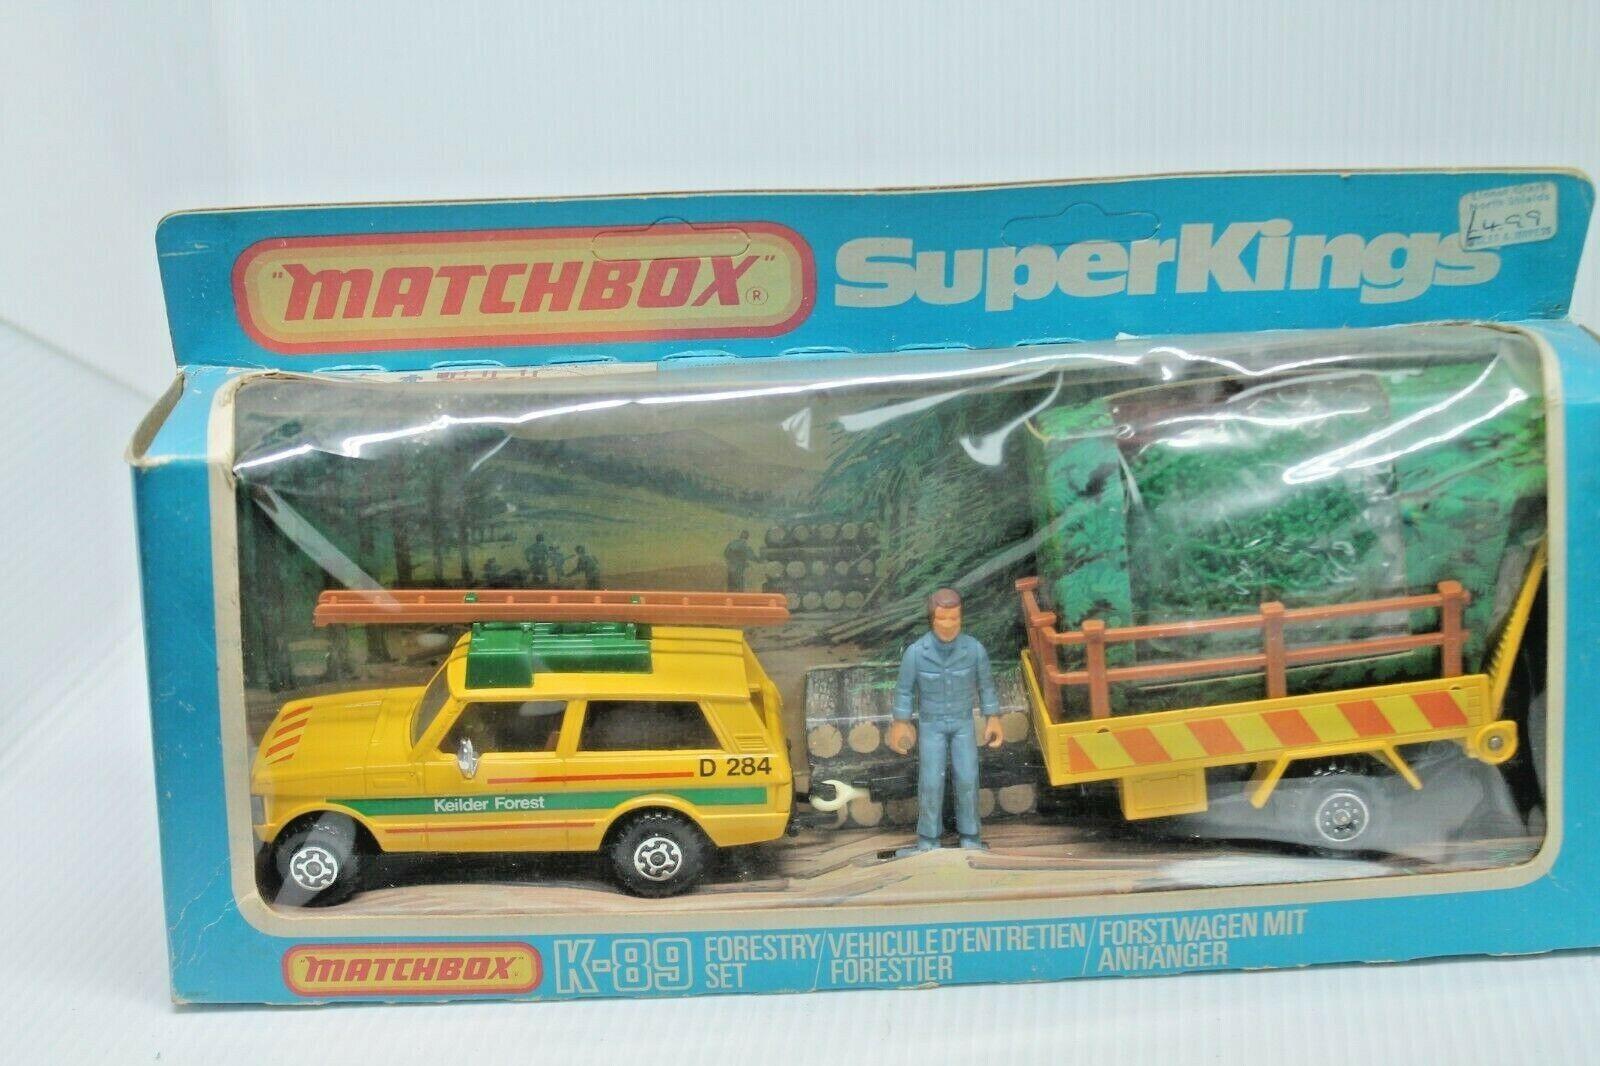 Matchbox súperkings k-89  range rover forstwagen con remolque  embalaje original  1979